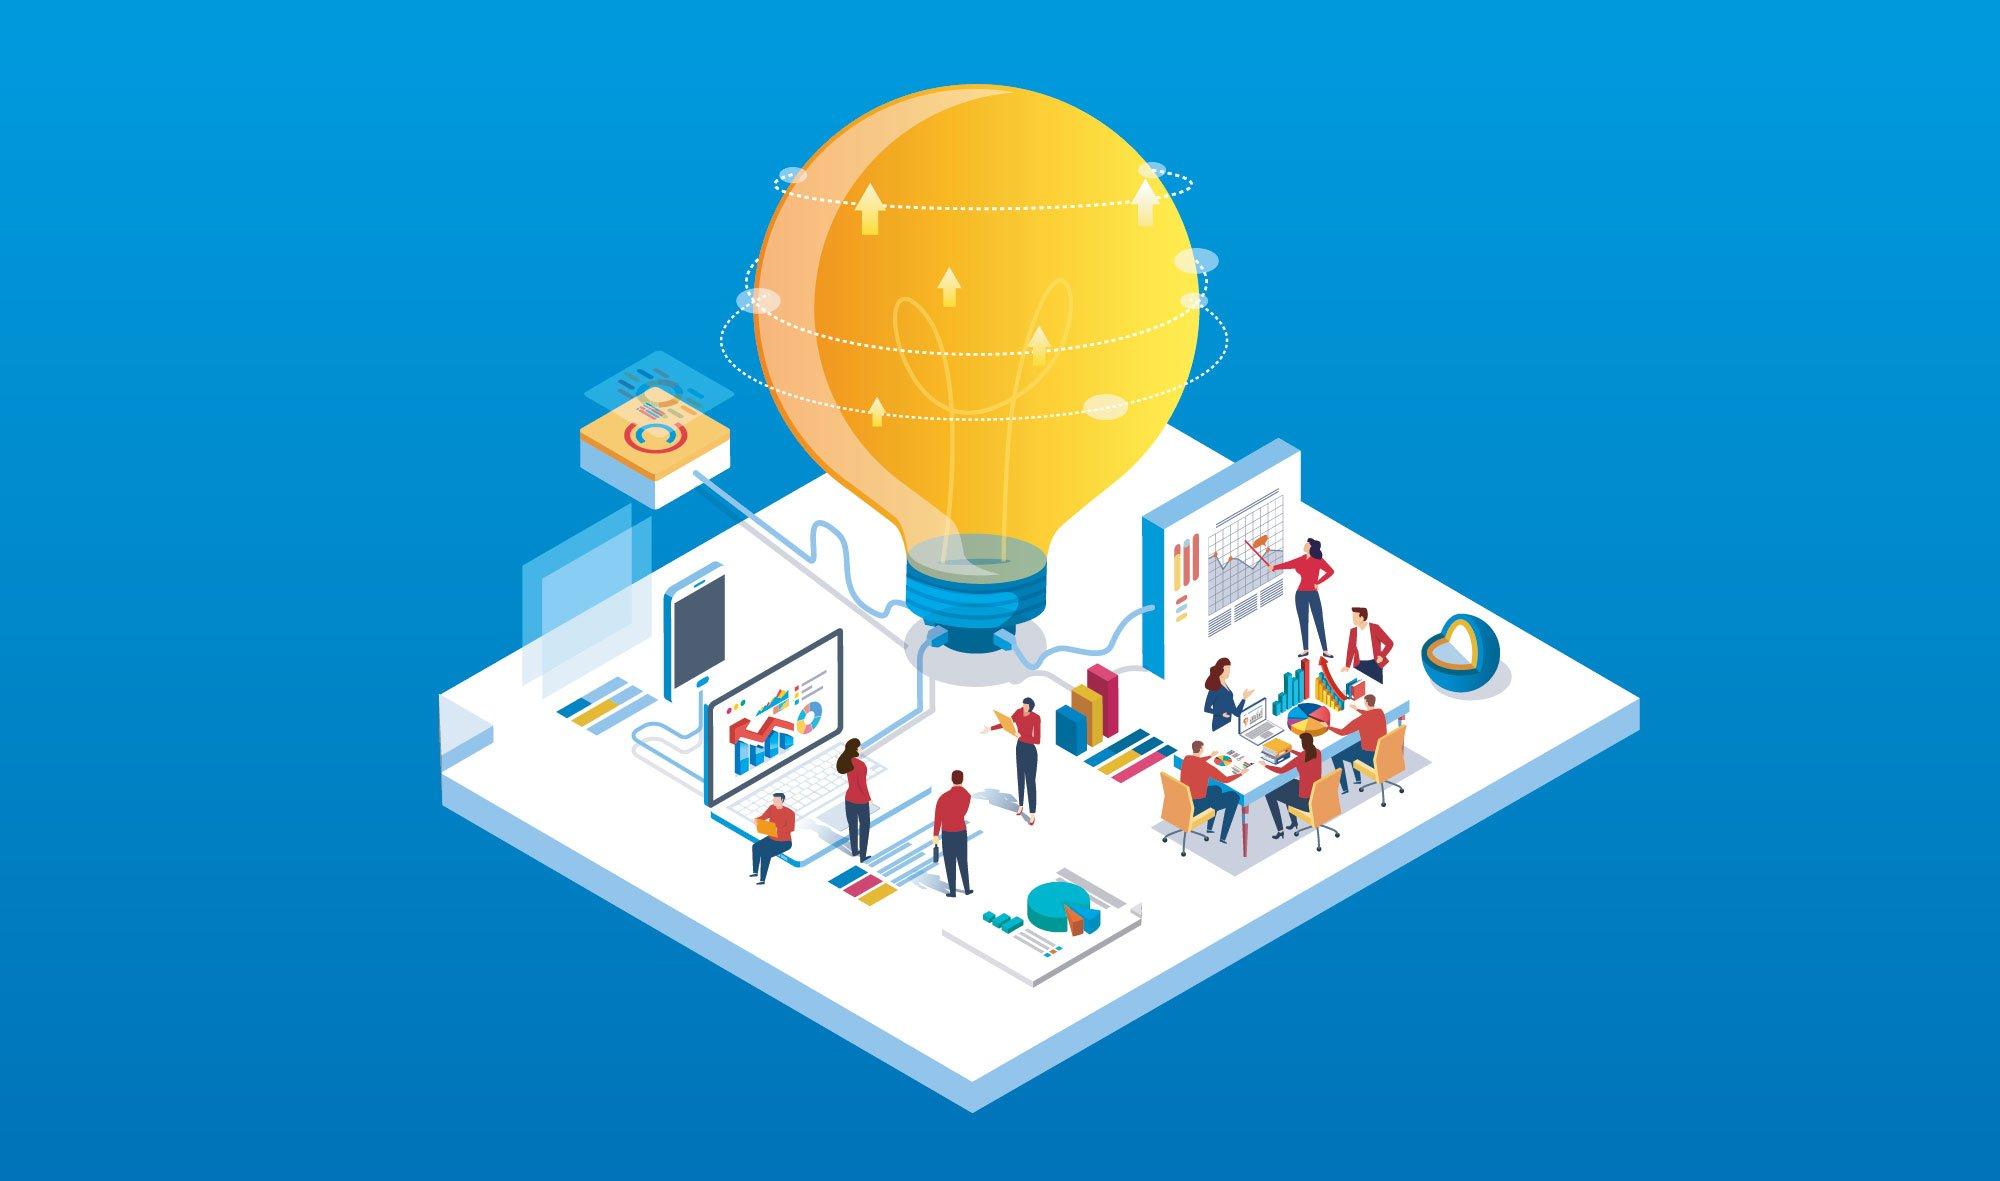 team-organization-data-automation-ideas-change